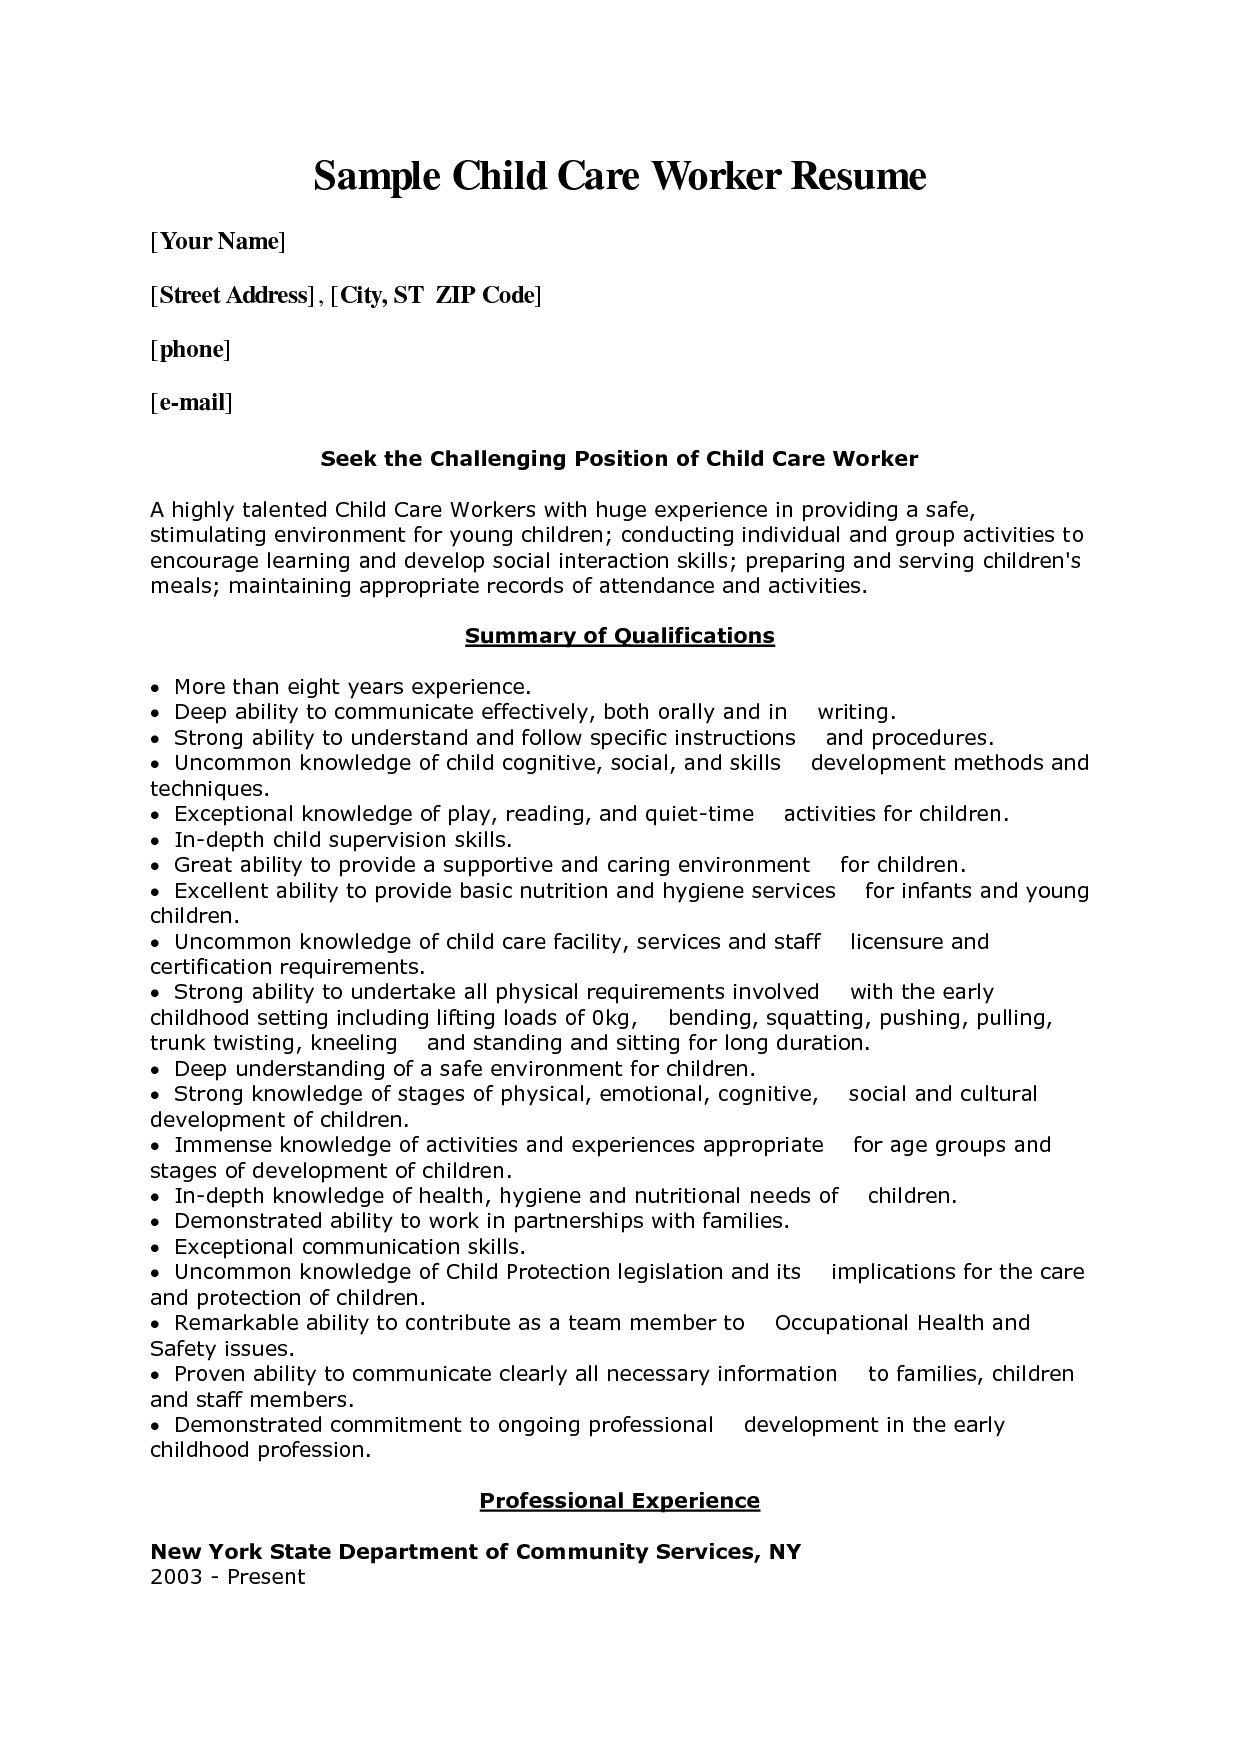 Professional Social Worker Cover Letter   Sample Cover Letter For ...